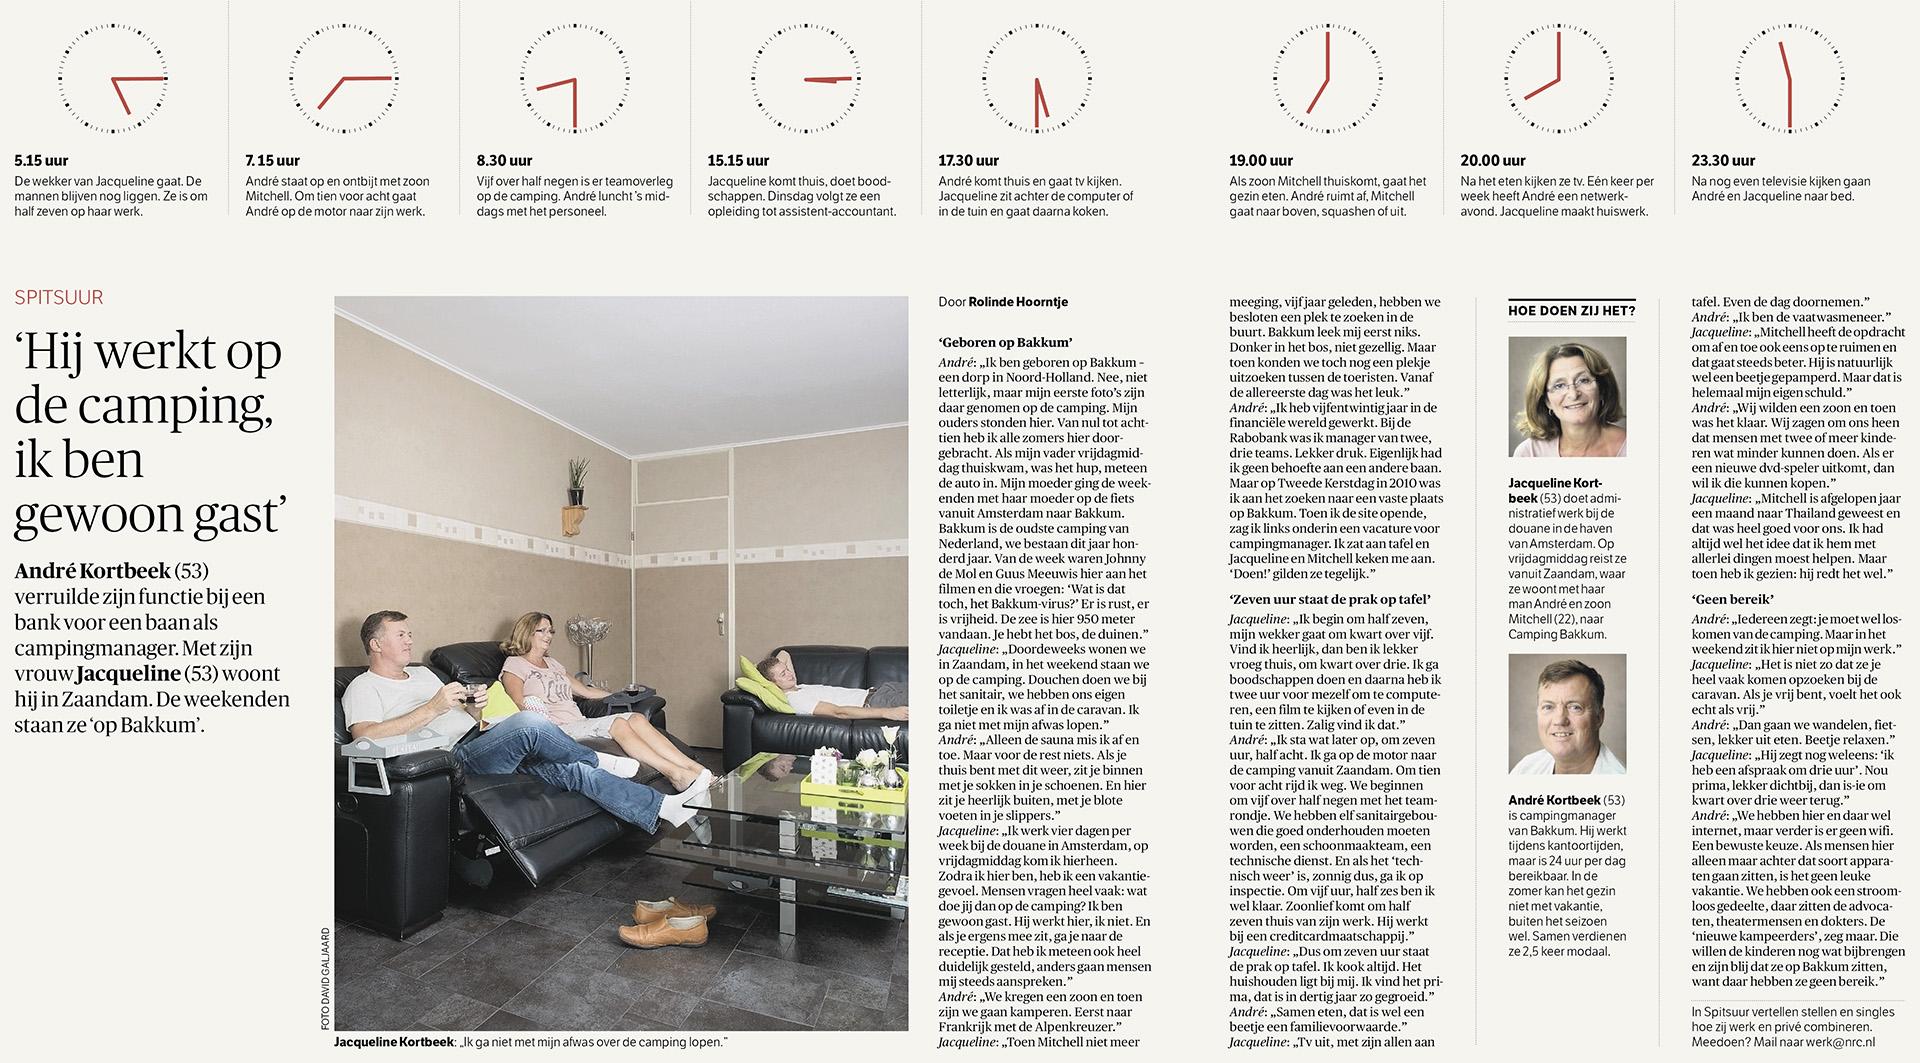 NRC Handelsblad - Economie - Spitsuur - 2014 - David Galjaard